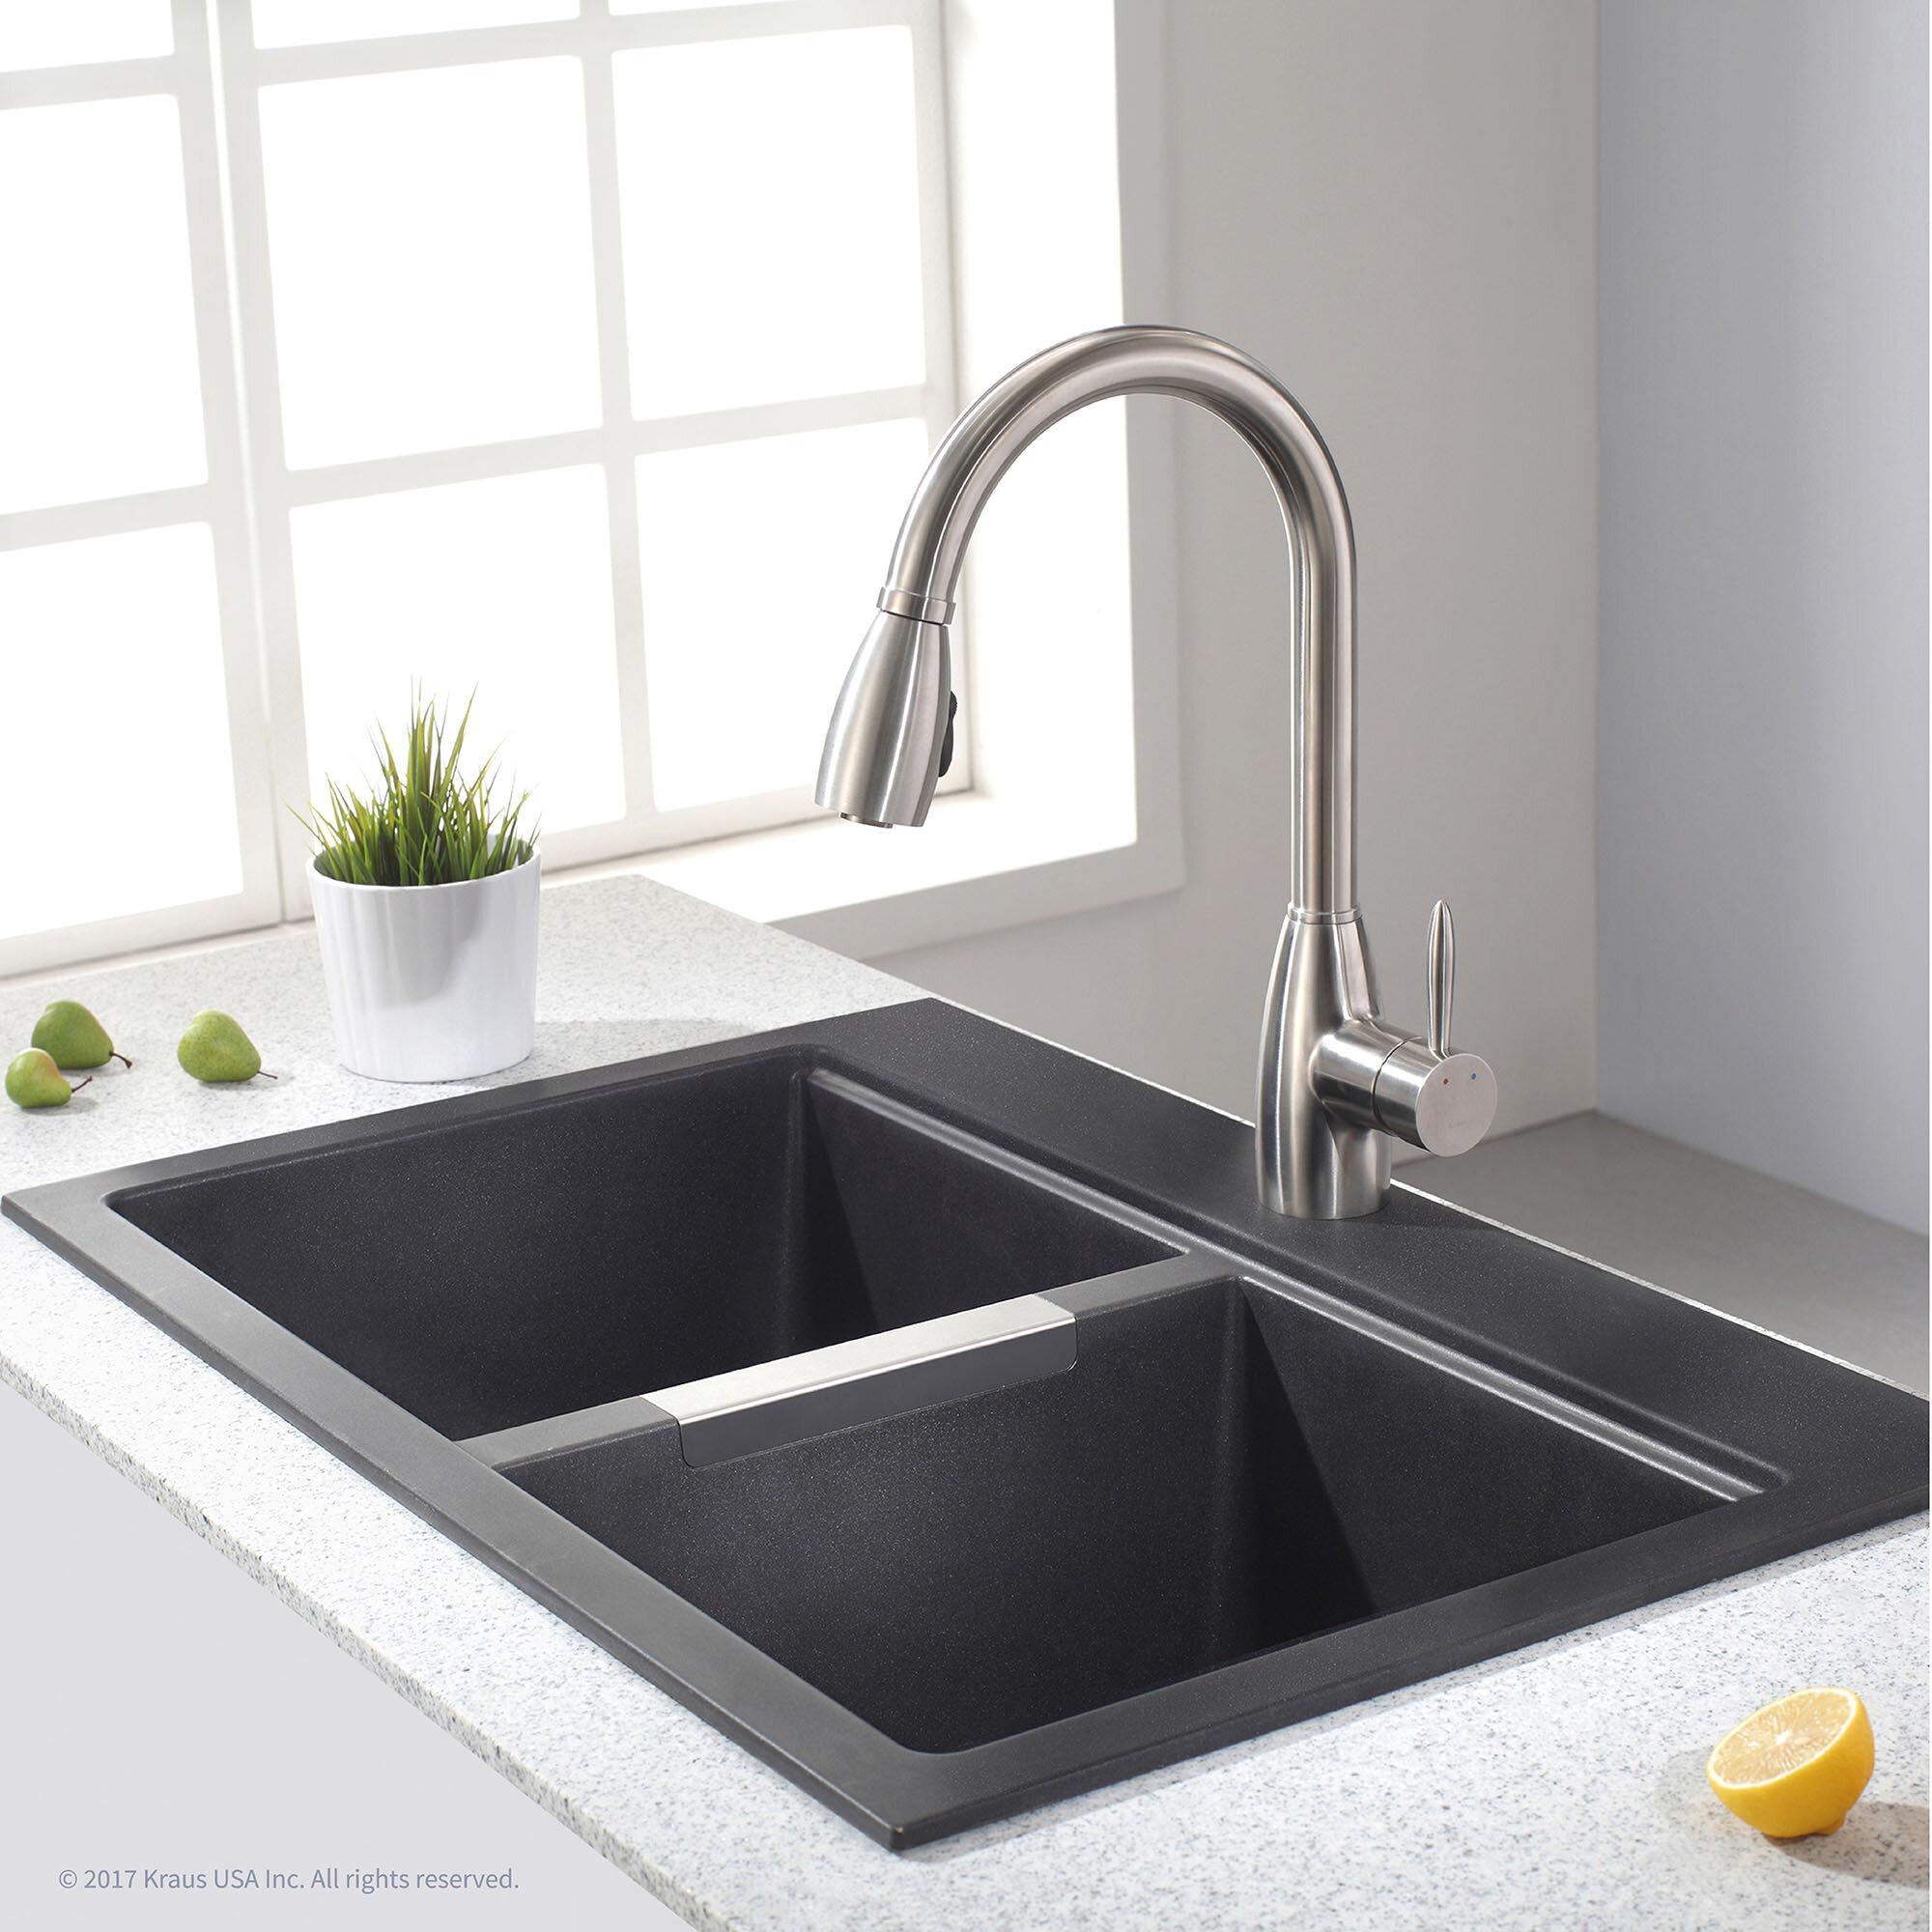 Kraus granite 33 x 22 double basin dual mount kitchen sink kraus granite 33 x 22 double basin dual mount kitchen sink reviews wayfair workwithnaturefo